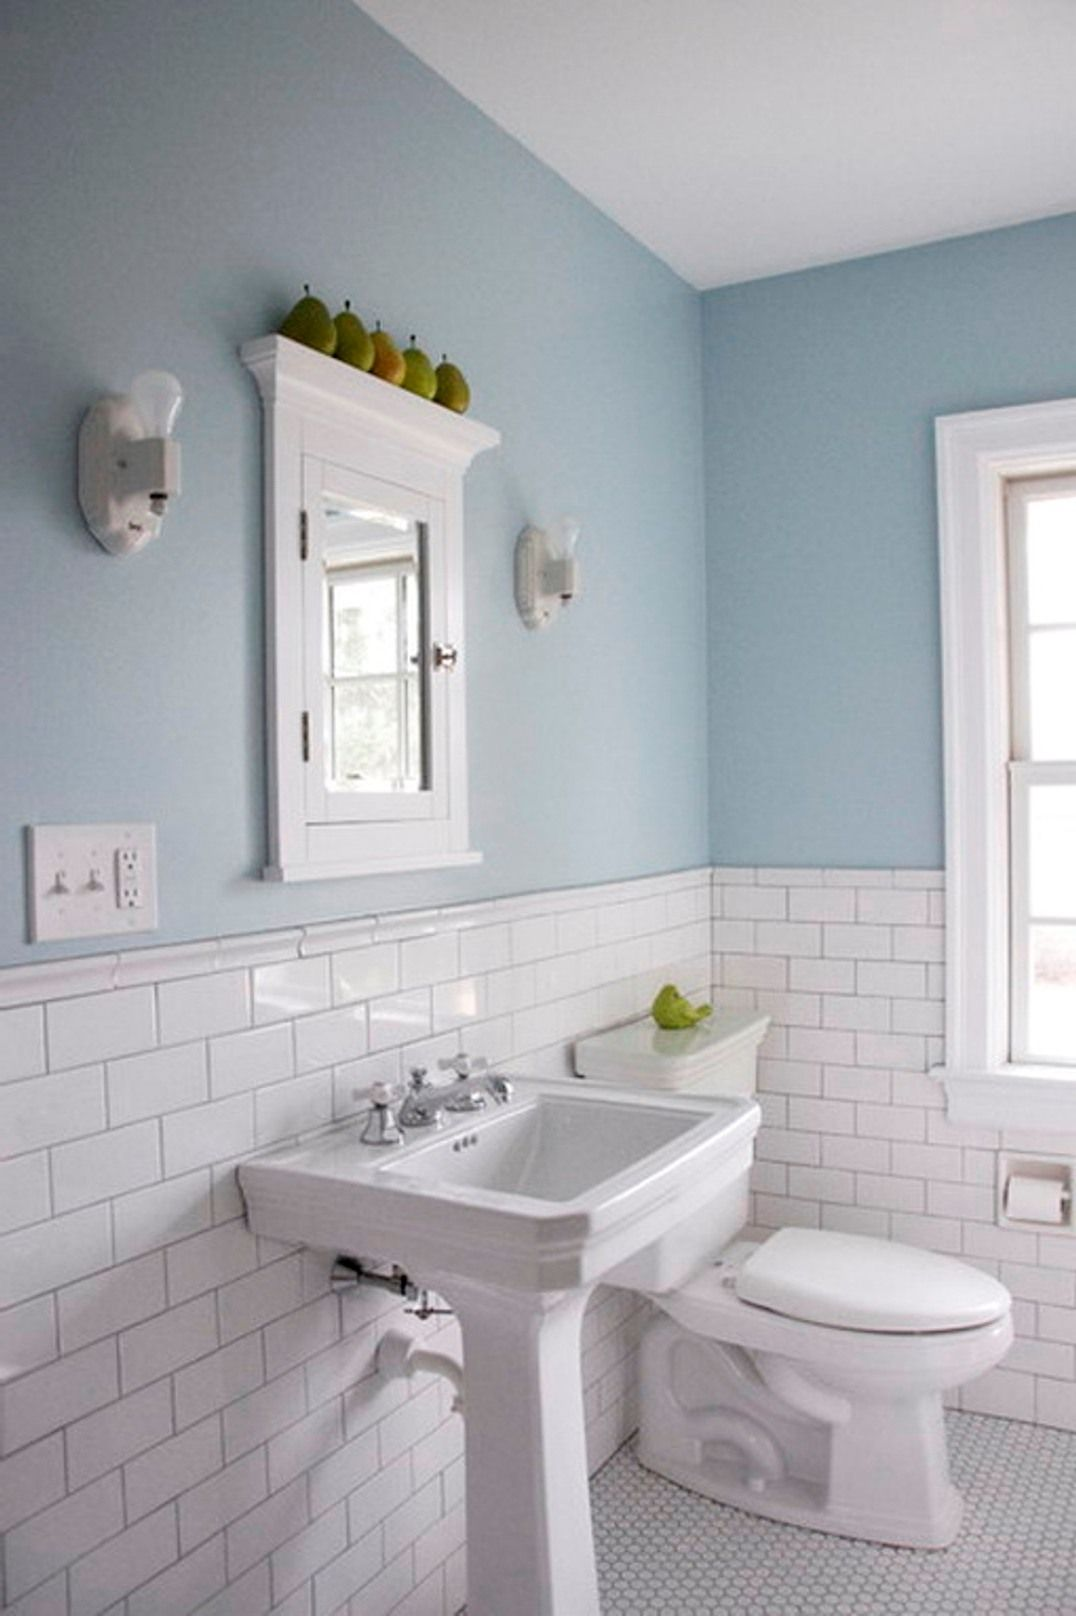 Enchanting Blue And White Bathroom Wall Tile White Subway Tile